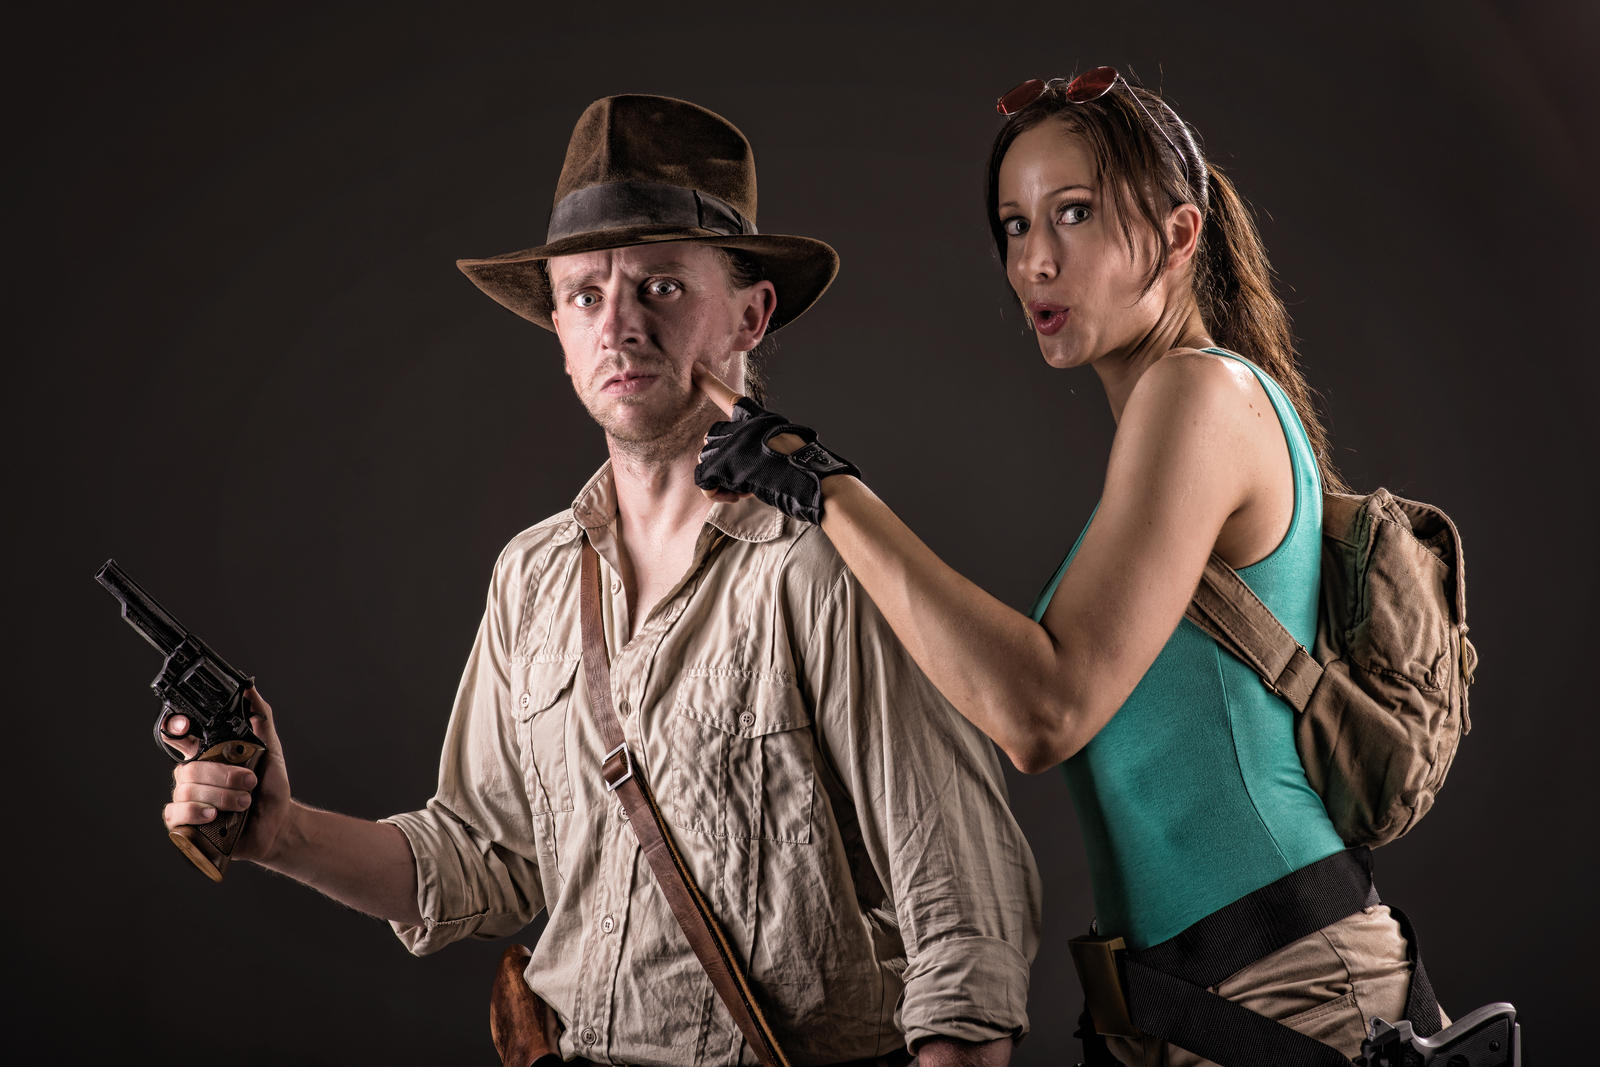 Lara Croft messing with Indiana Jones by ShonaAdventures